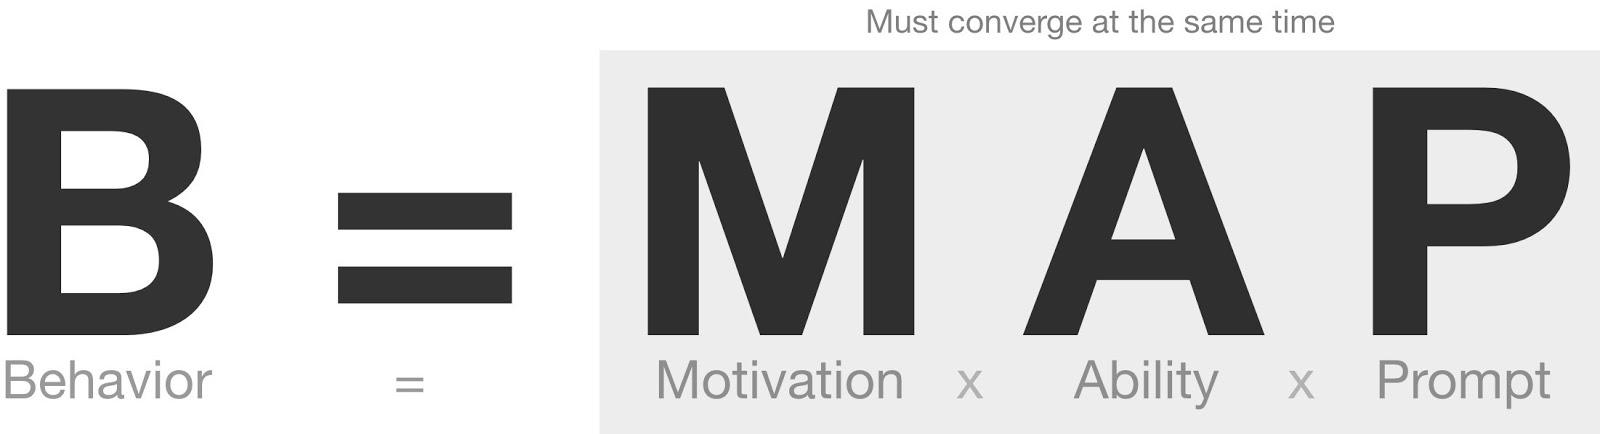 The BJ Bogg Behavior Model is that Behavior = Motivation x Ability x Prompt